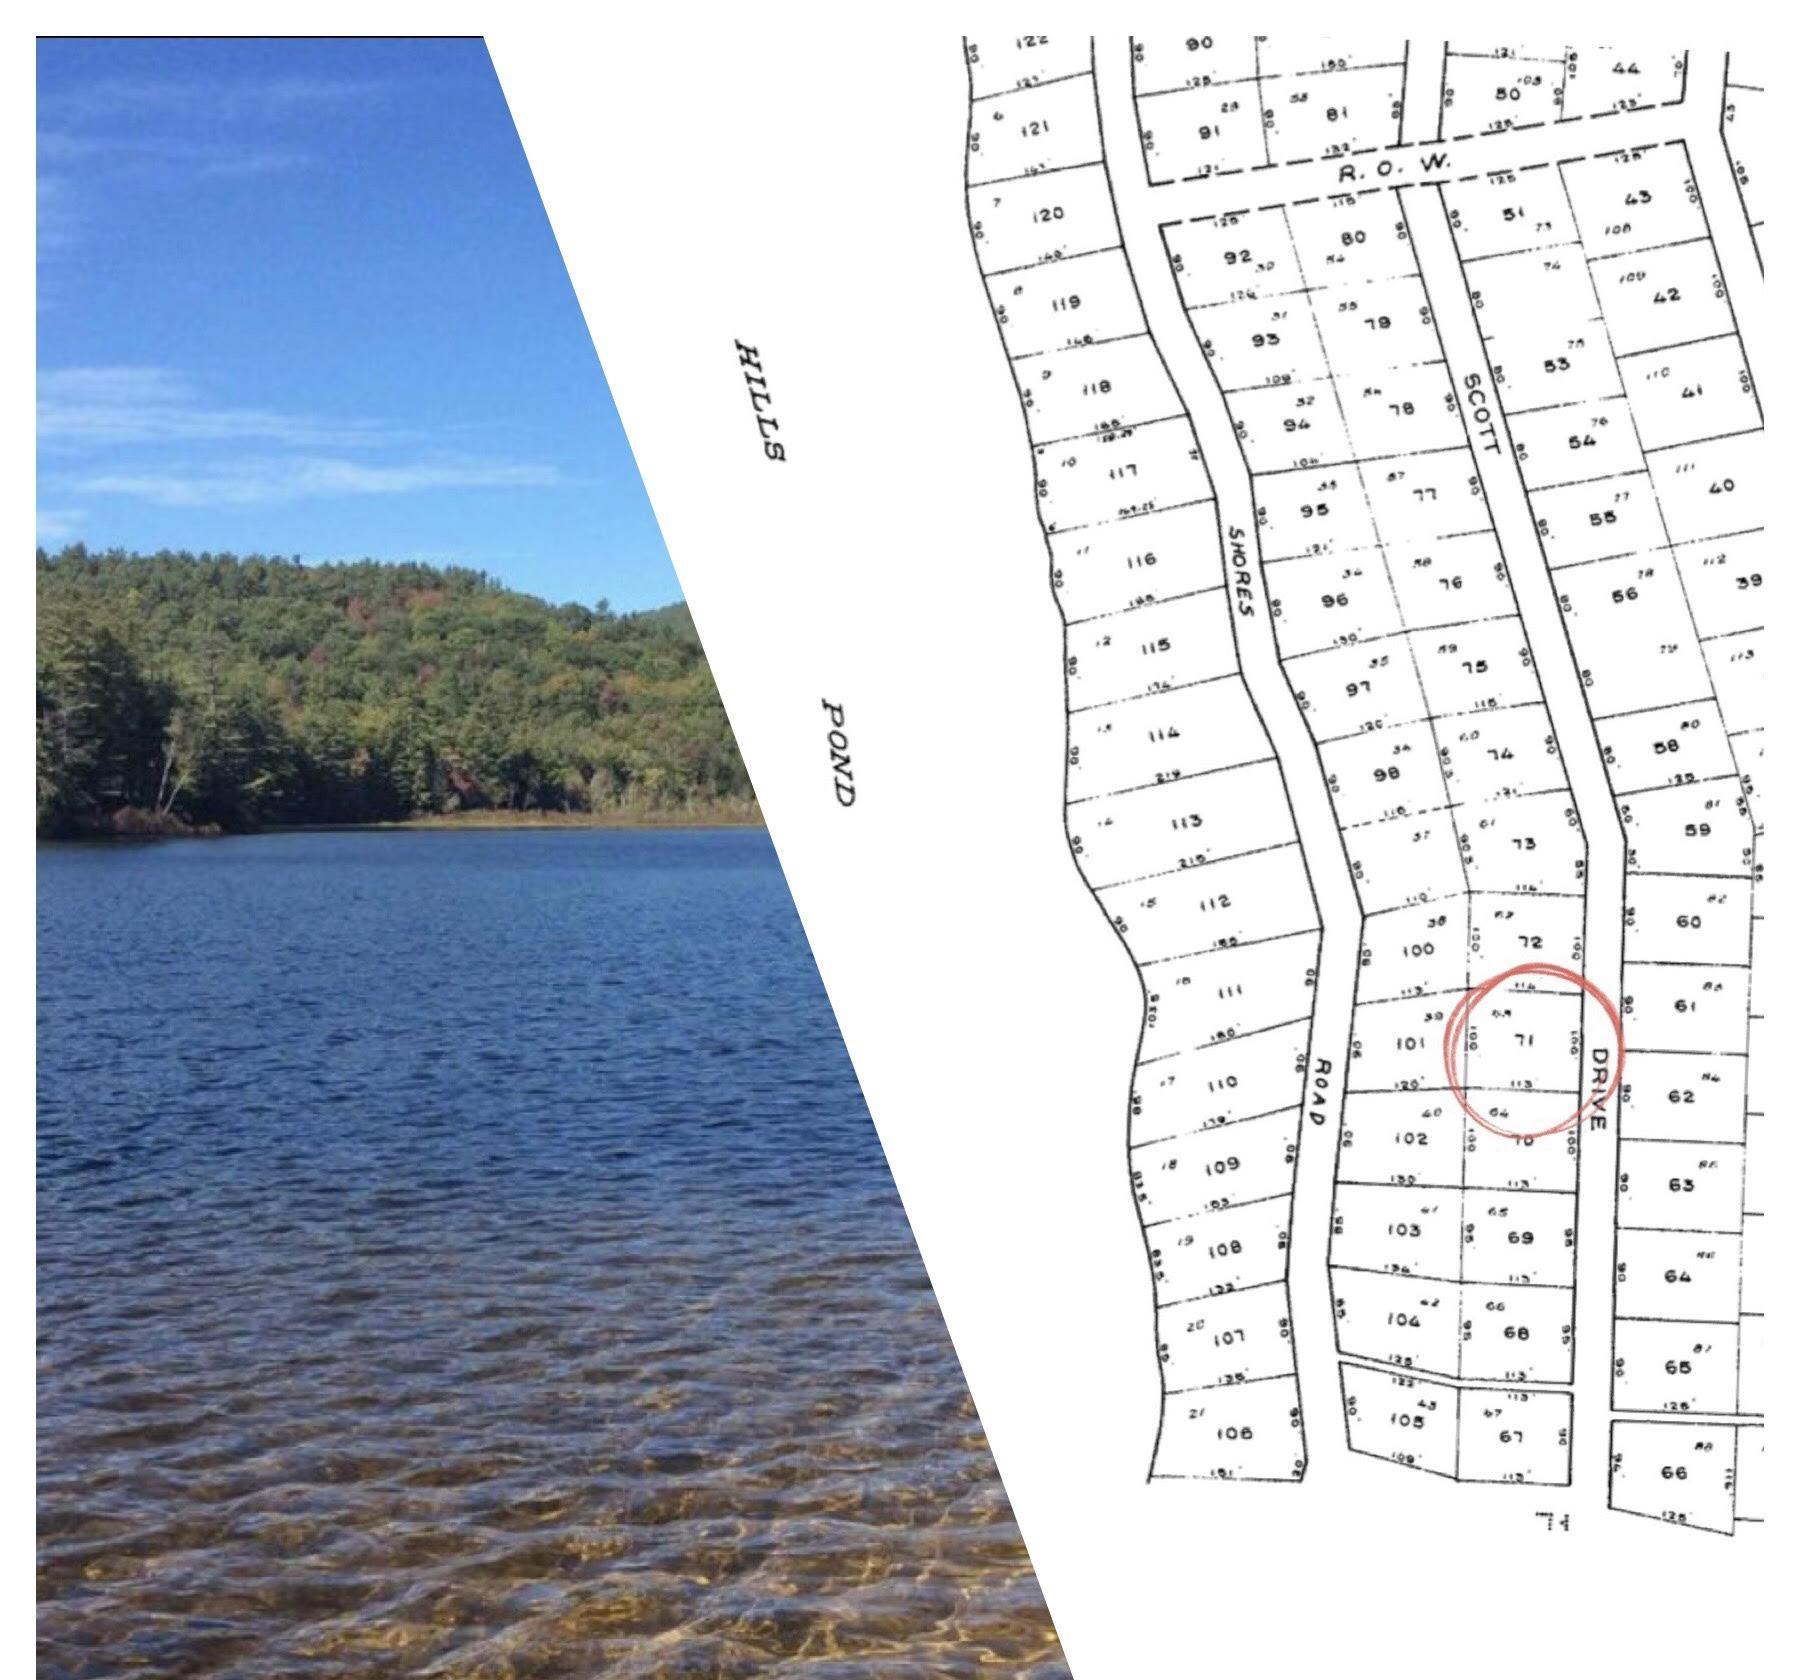 ALTON NHLAND  for sale $$40,000 | 0.25 Acres  | Price Per Acre $0